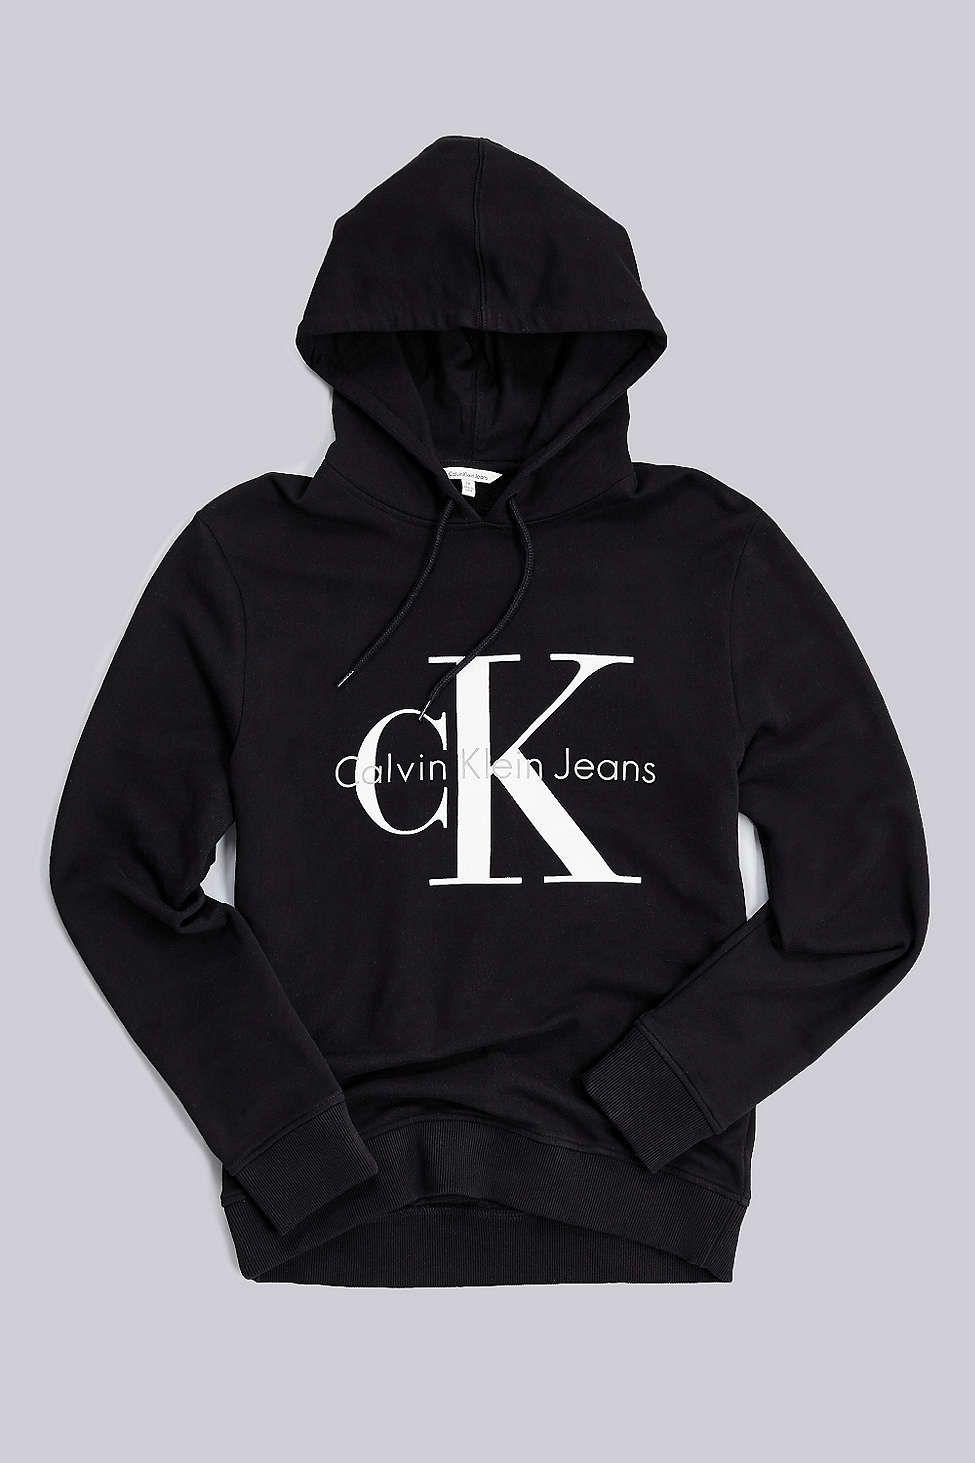 6343780b1104 Calvin Klein Jeans Reissue Hoodie Sweatshirt